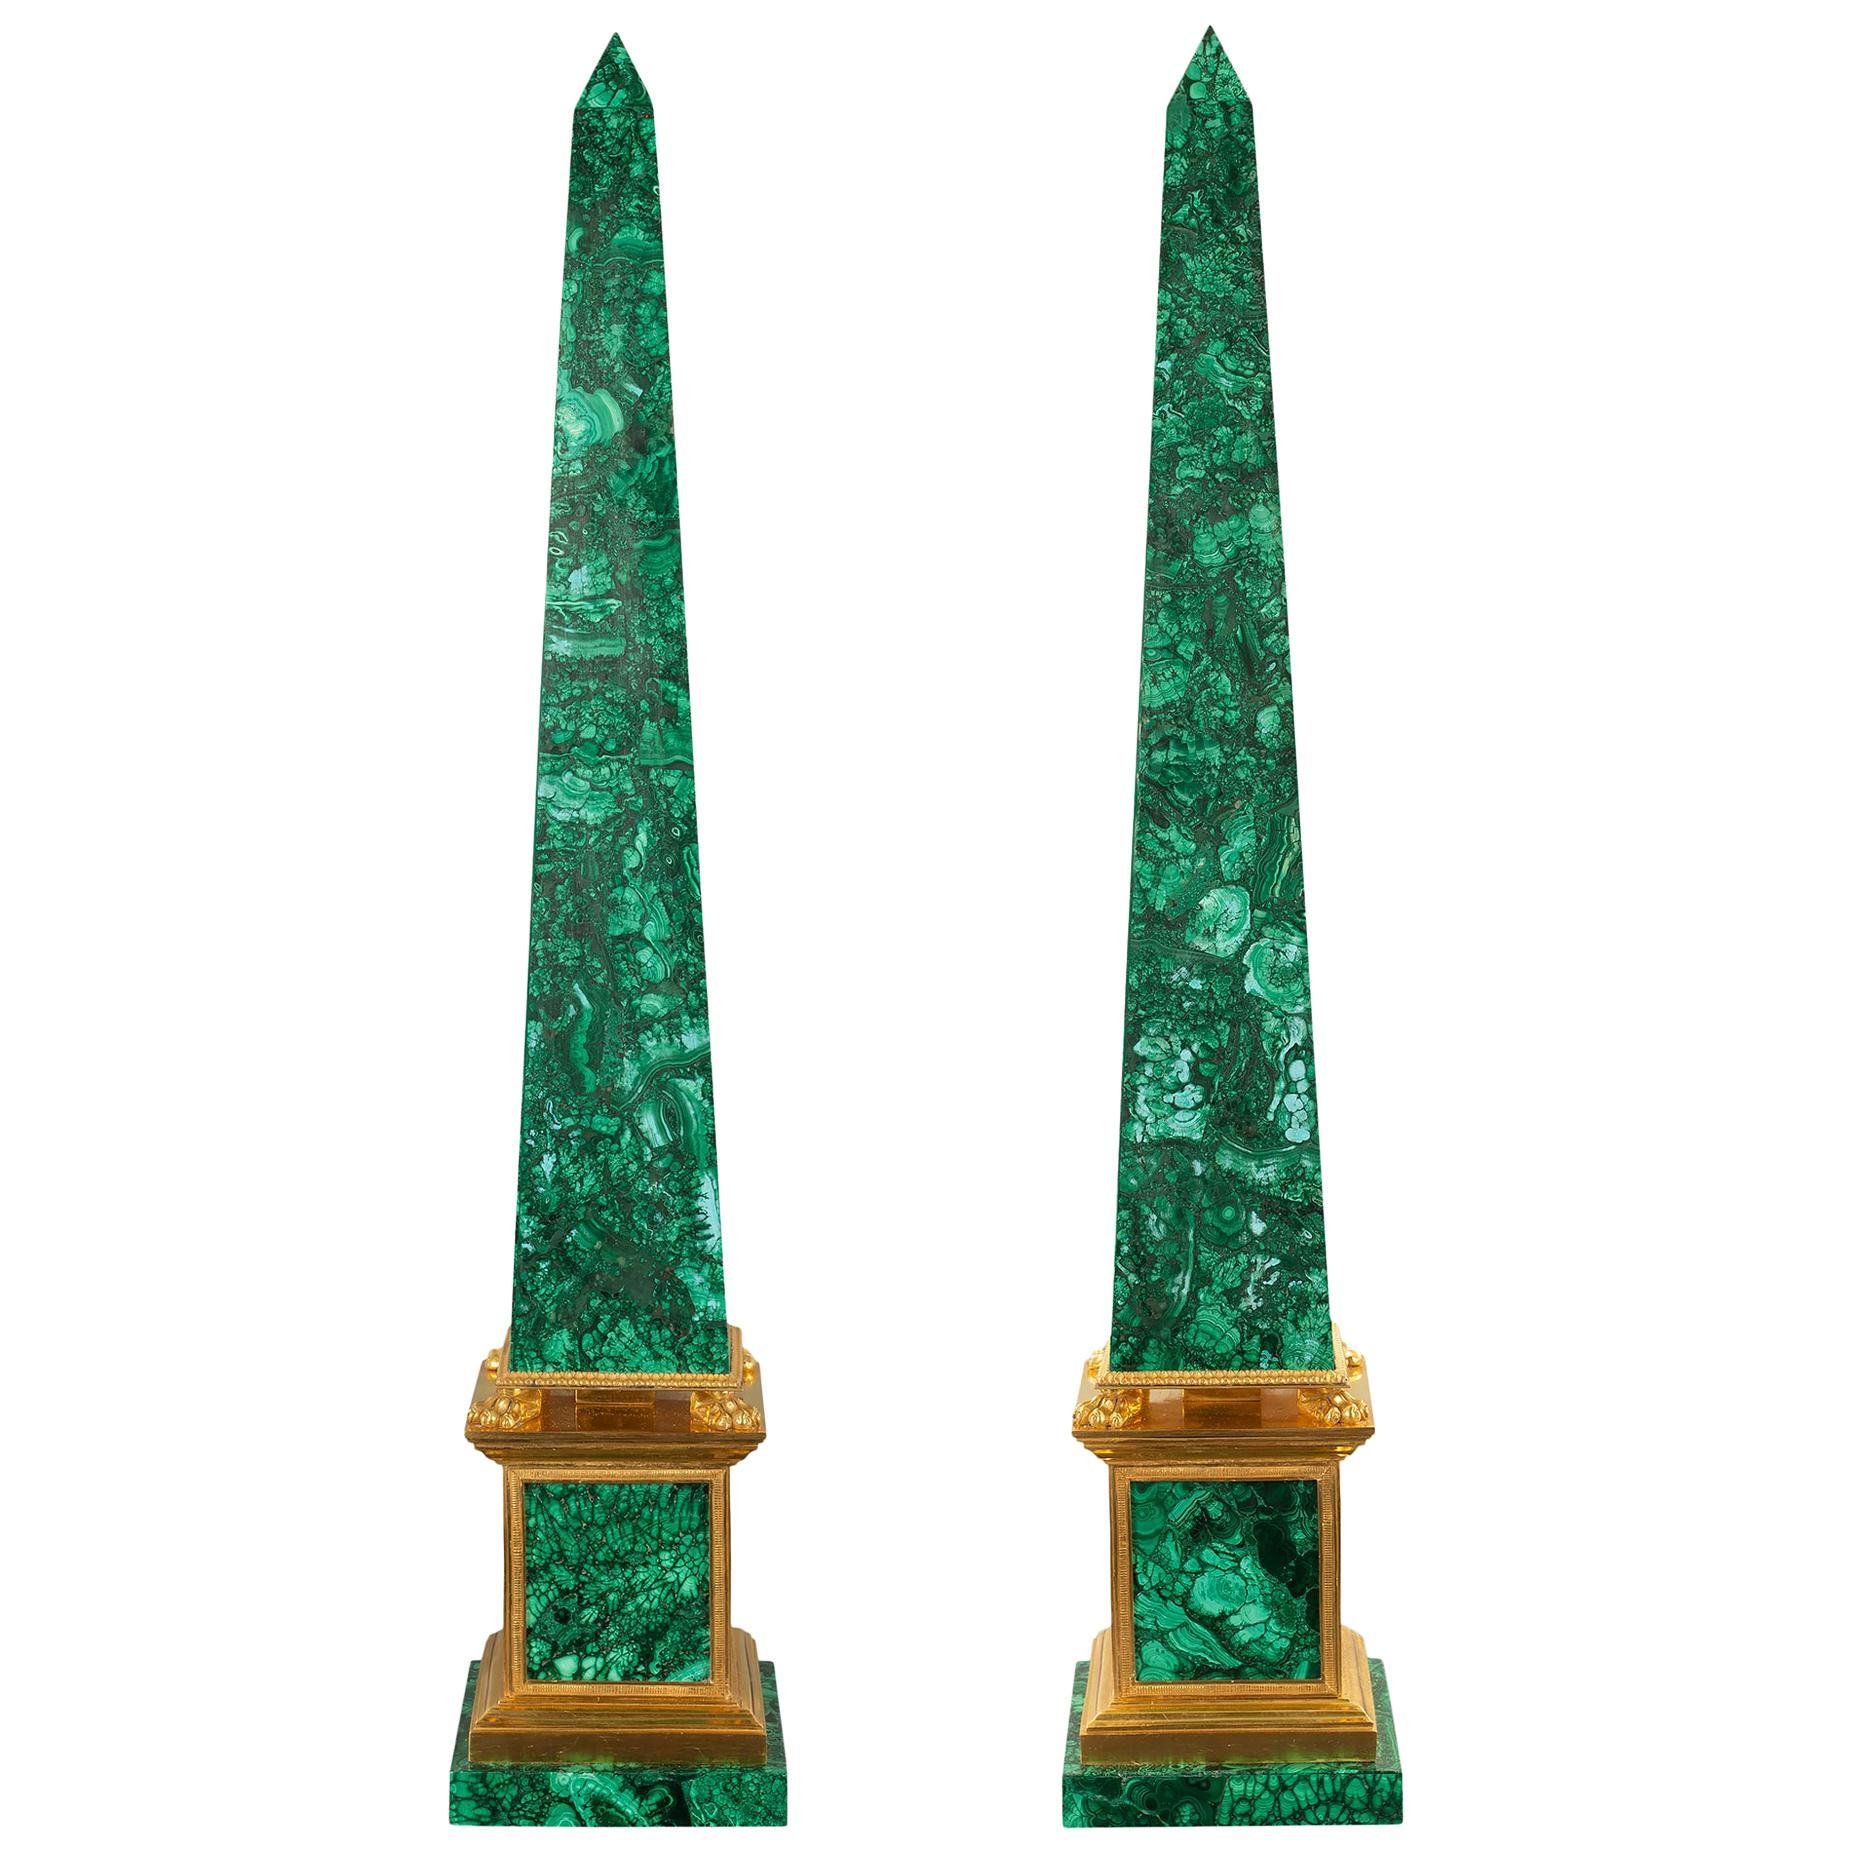 Italian 19th Century Neoclassical Style Malachite and Ormolu Obelisks